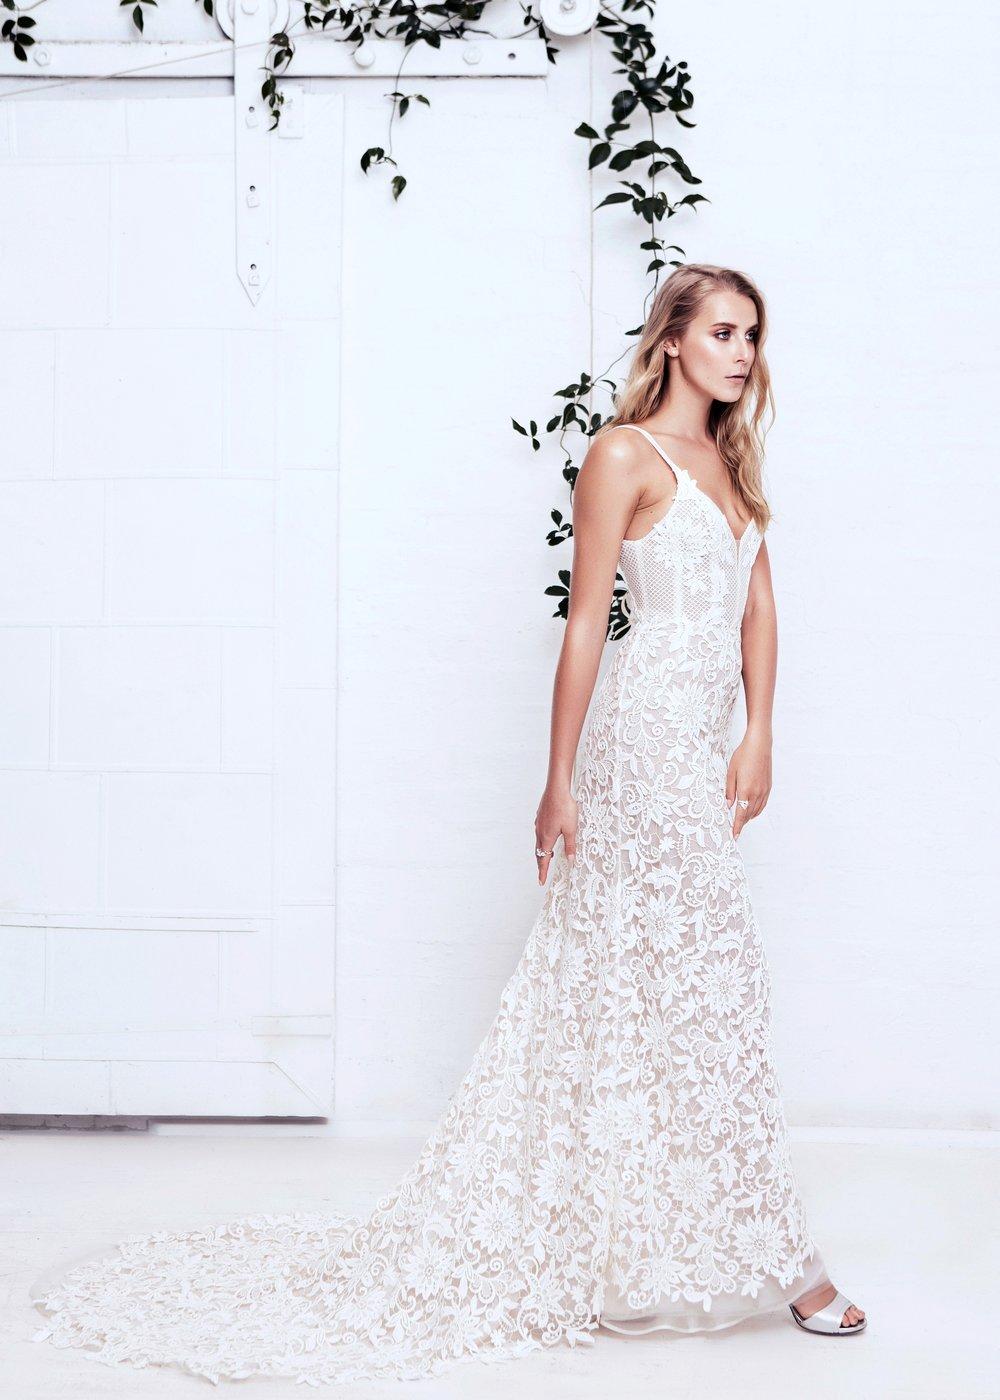 italian wedding dresses 2014